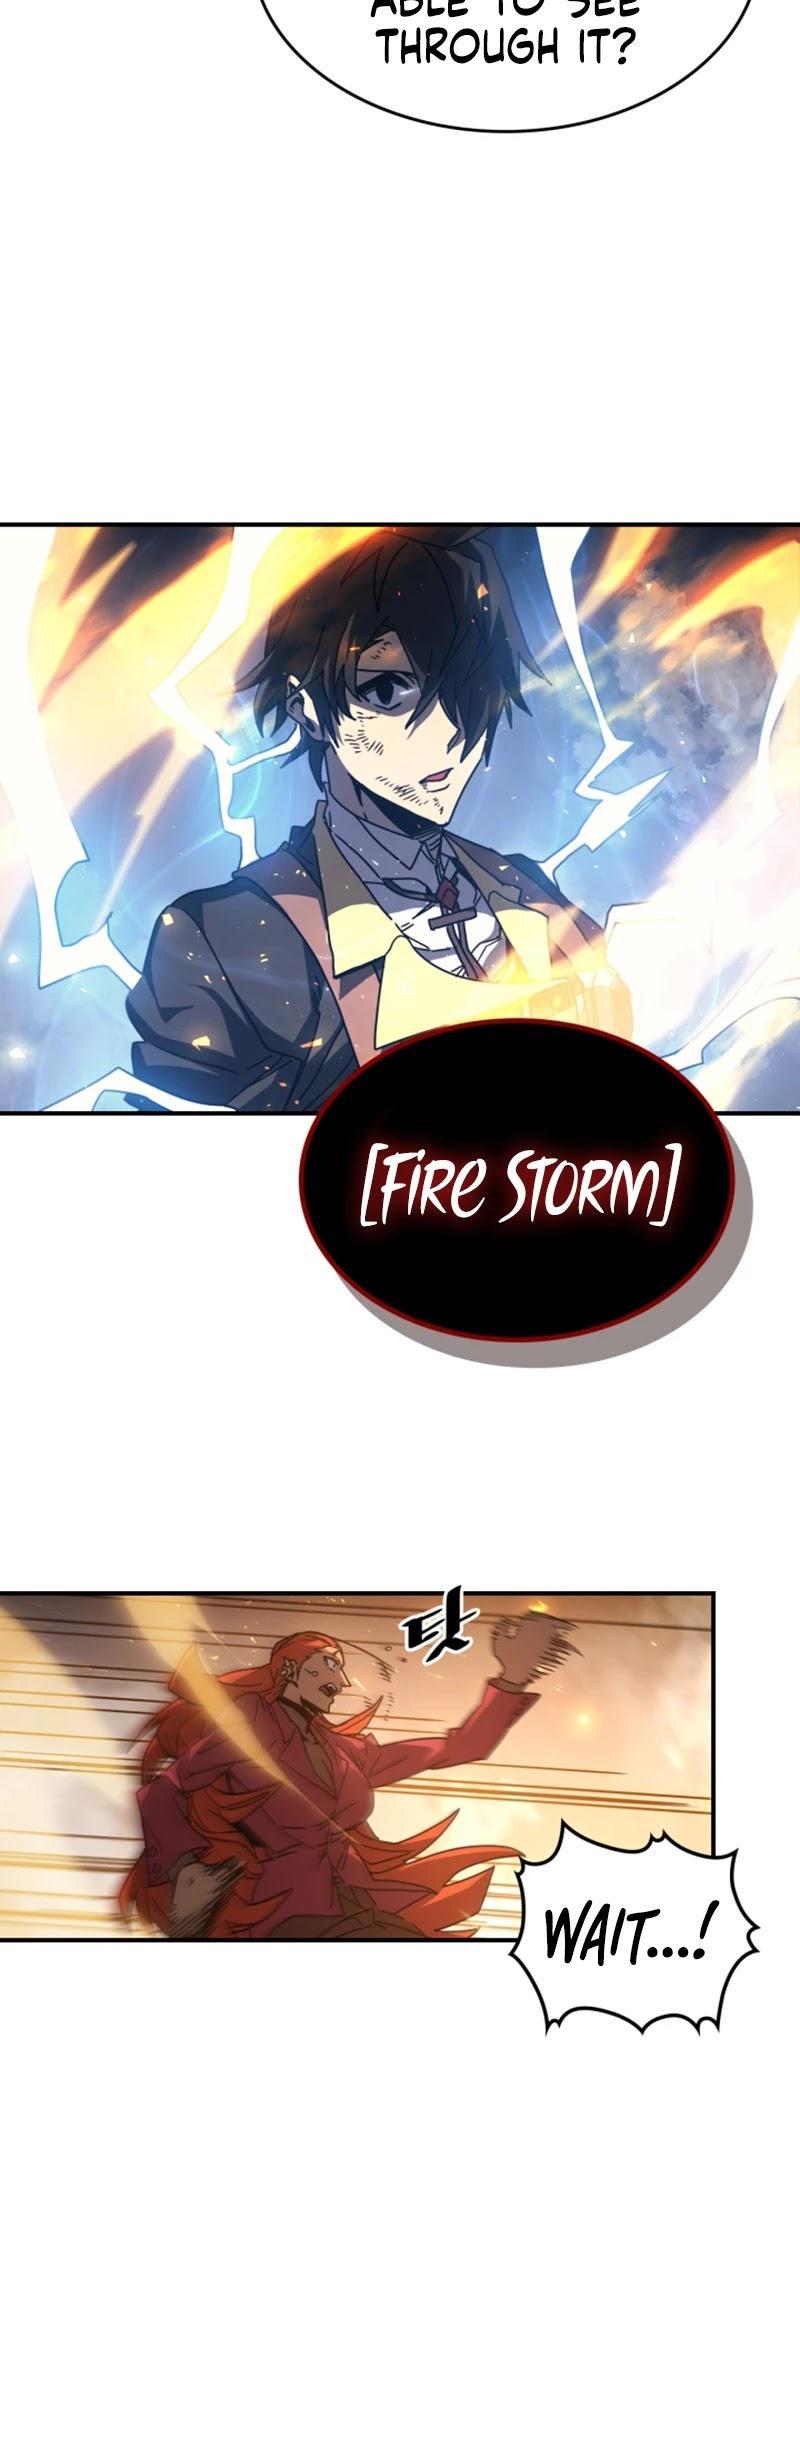 A Returner's Magic Should Be Special Chapter 161 page 25 - Mangakakalot